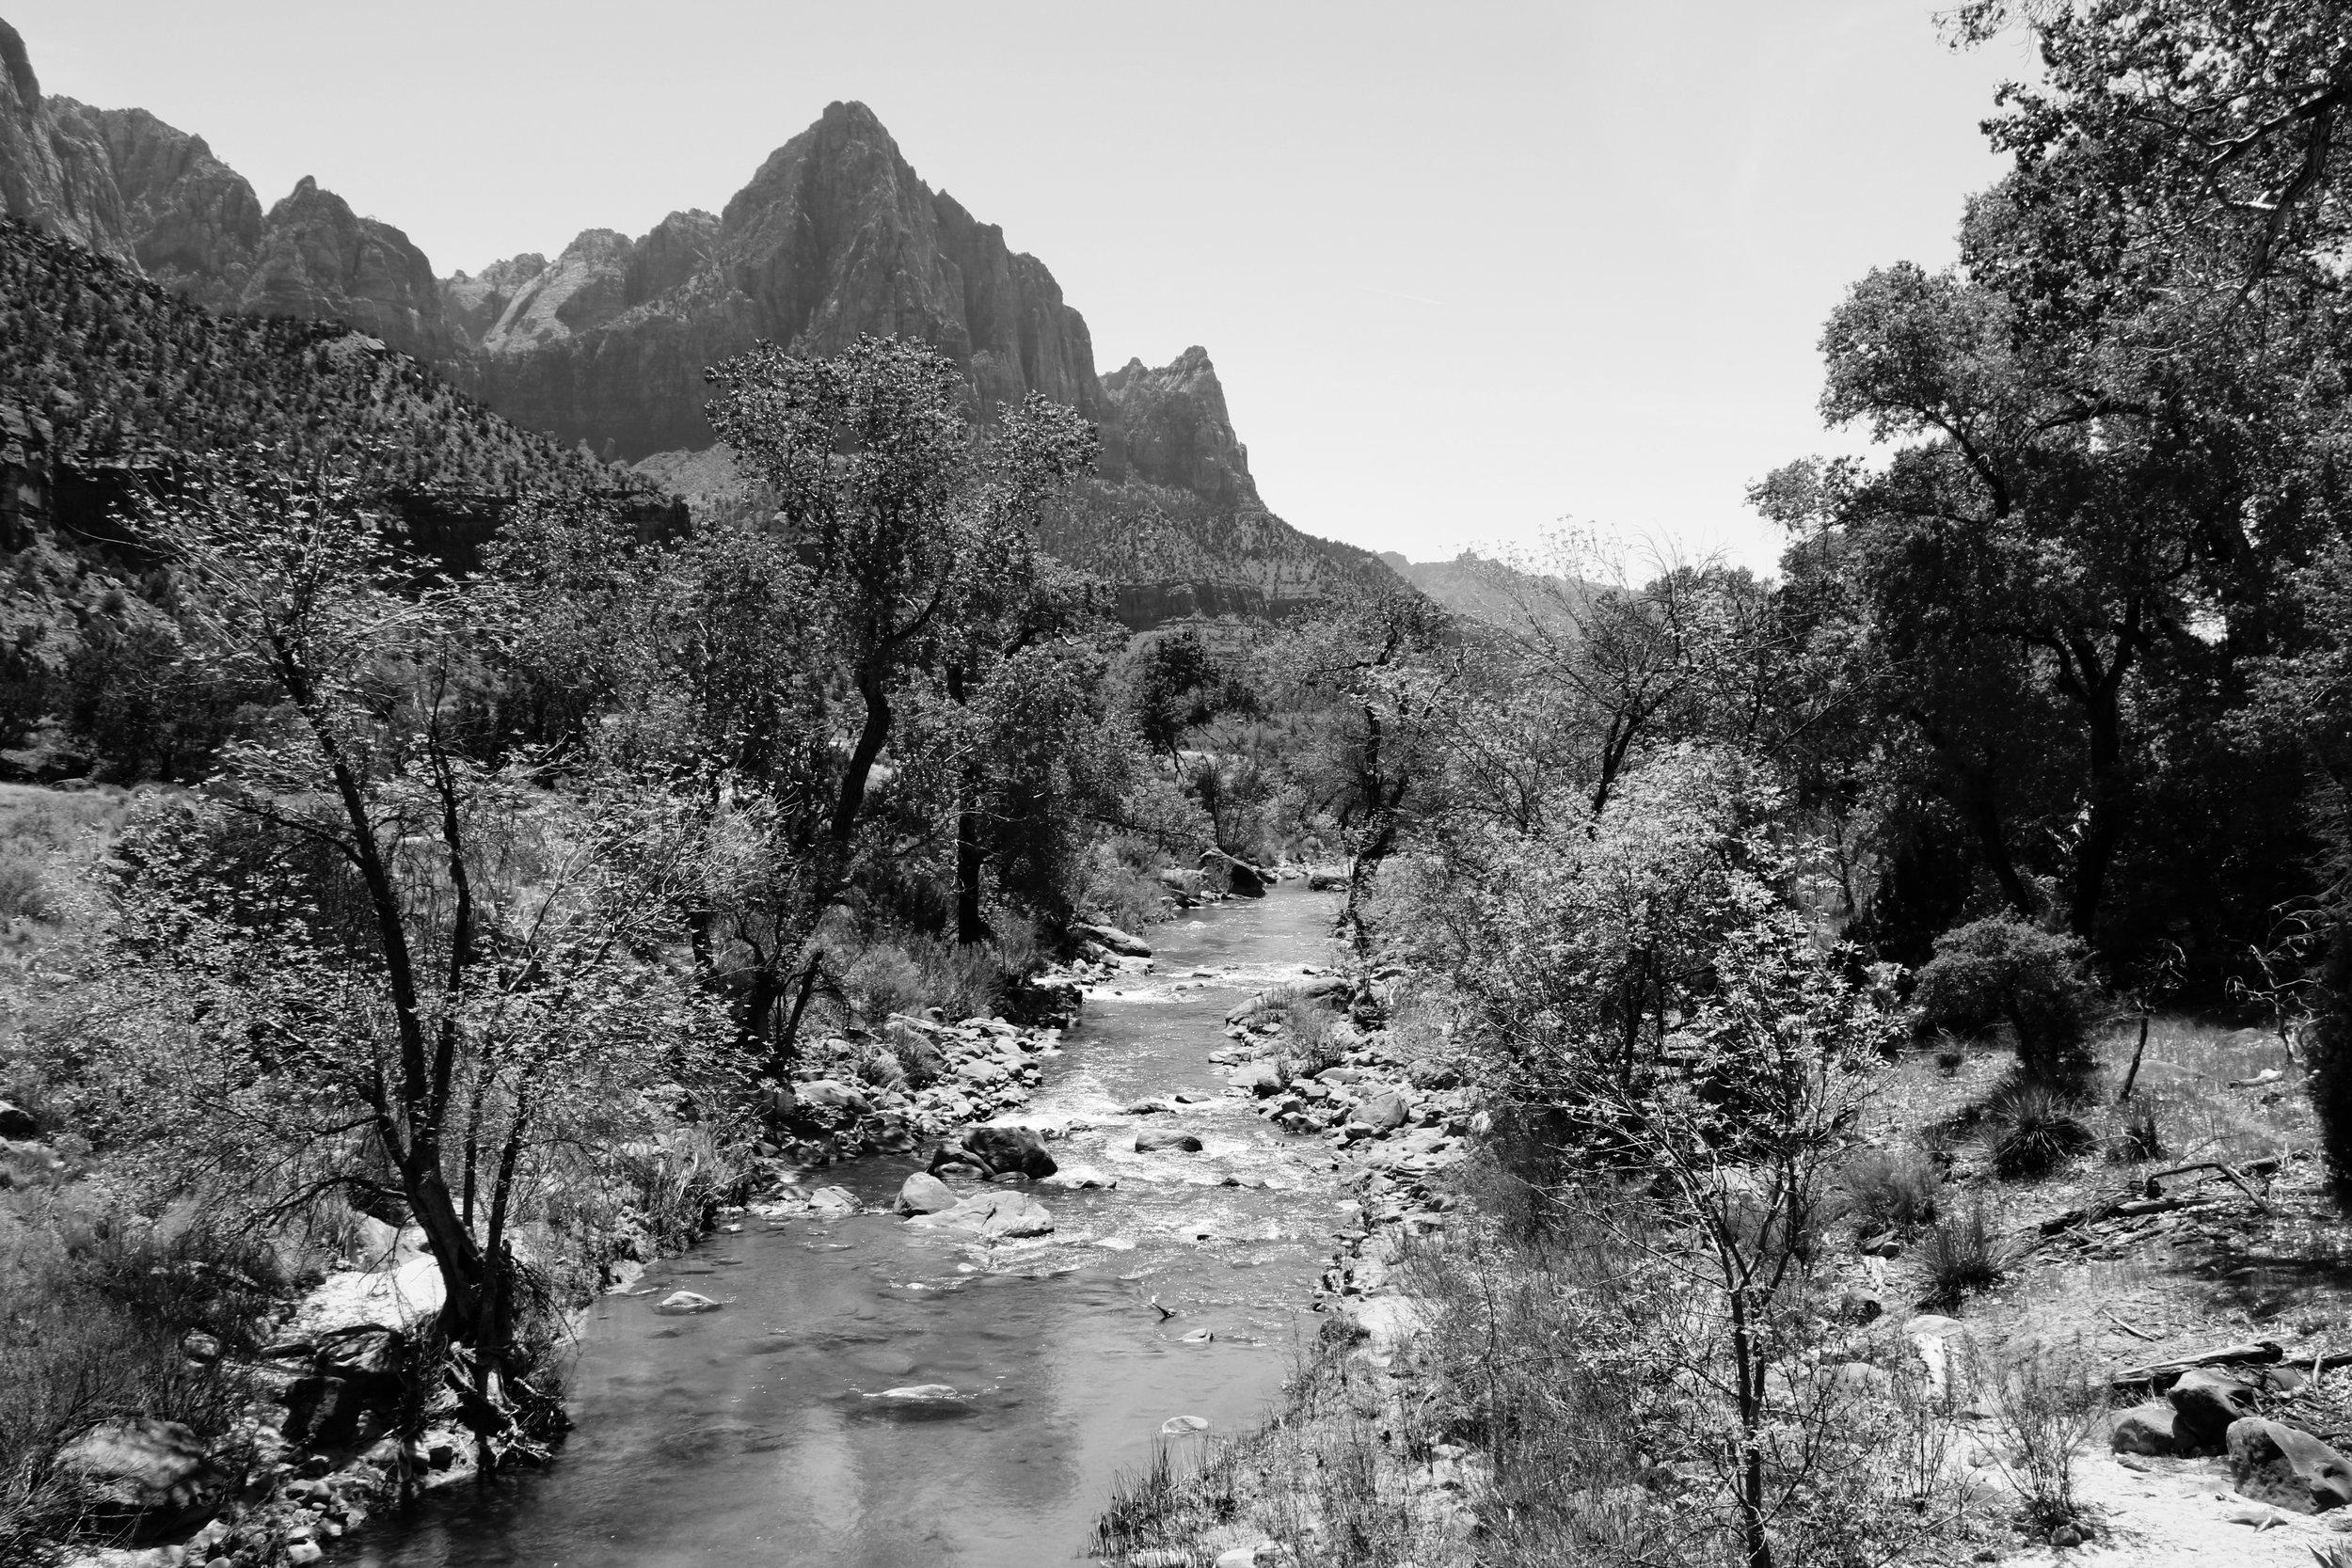 View from Kayenta Trail - Zion